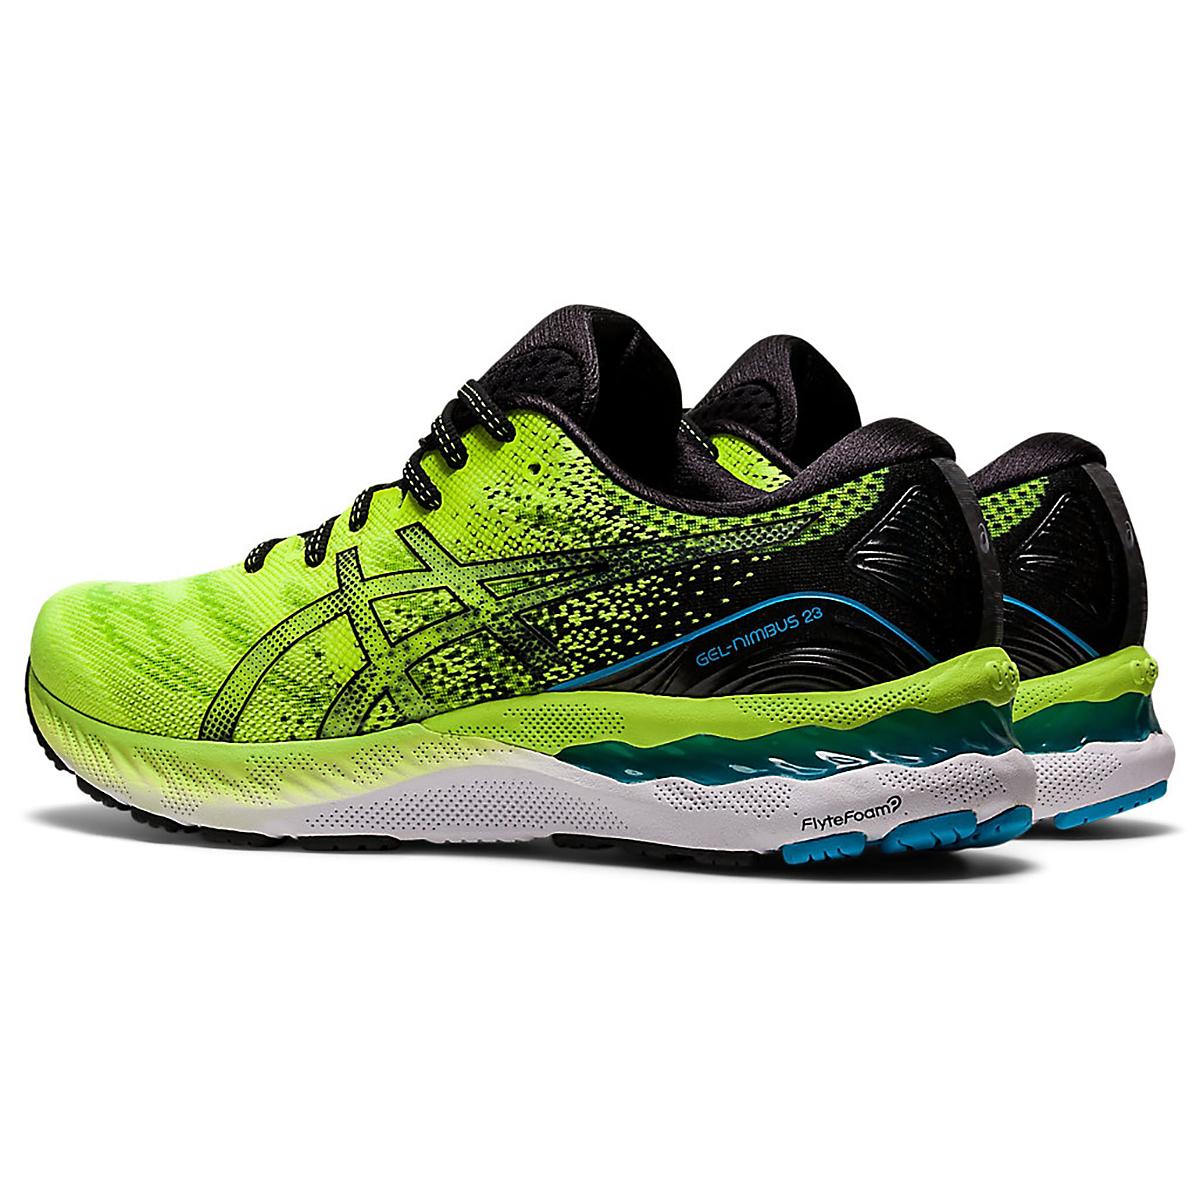 Men's Asics Gel-Nimbus 23 Running Shoe - Color: Hazard Green/Black - Size: 7 - Width: Regular, Hazard Green/Black, large, image 5